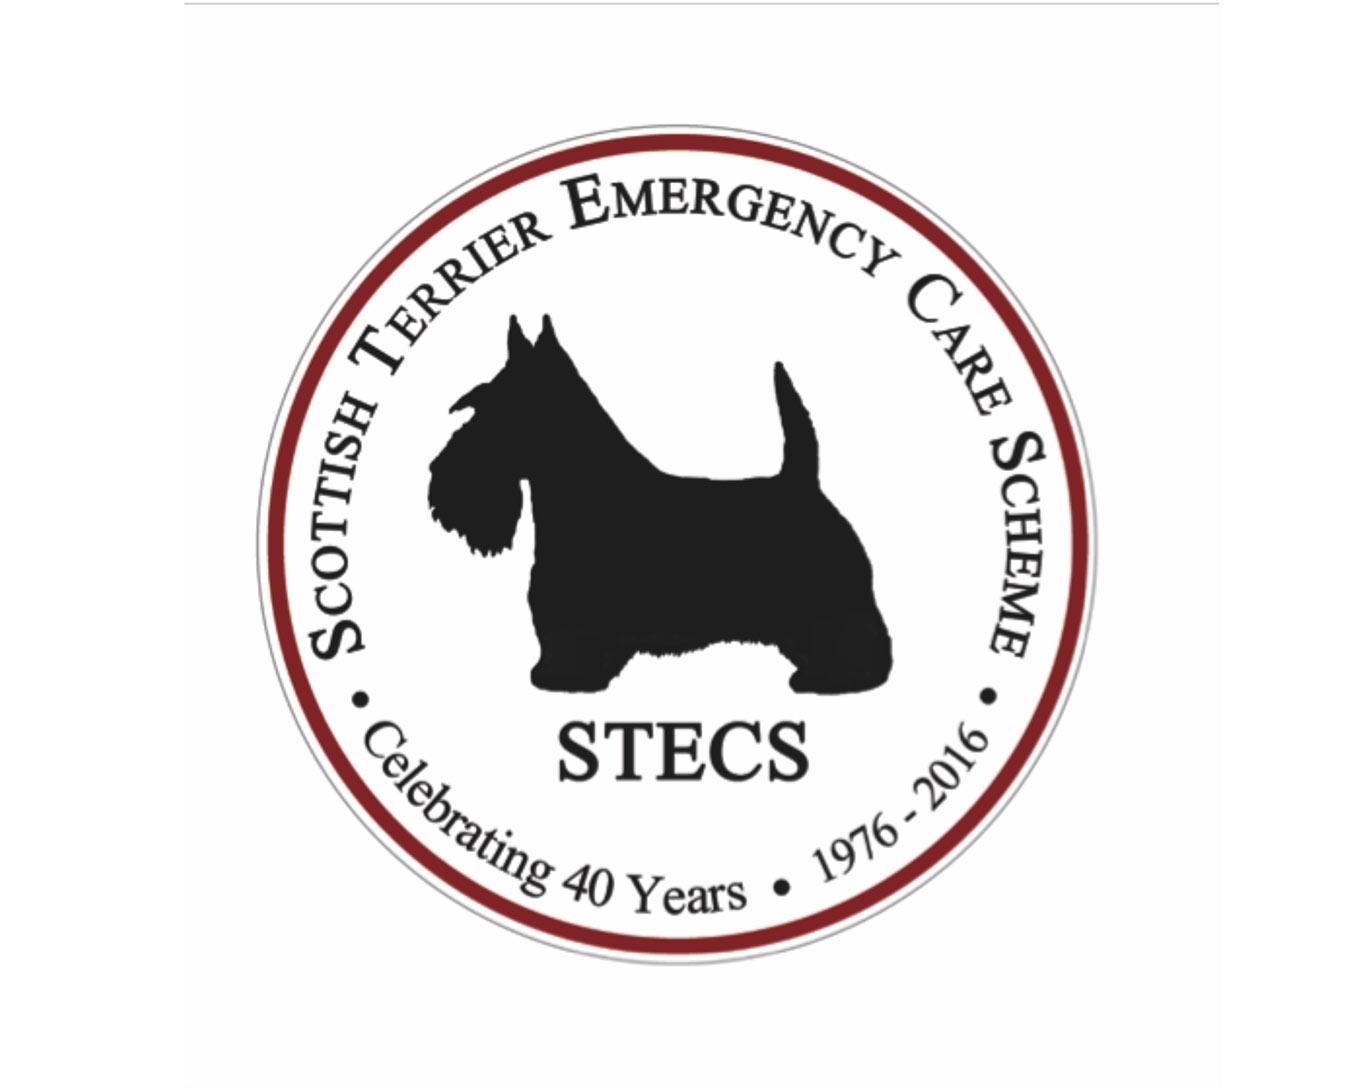 Stecs Commemorative Plate